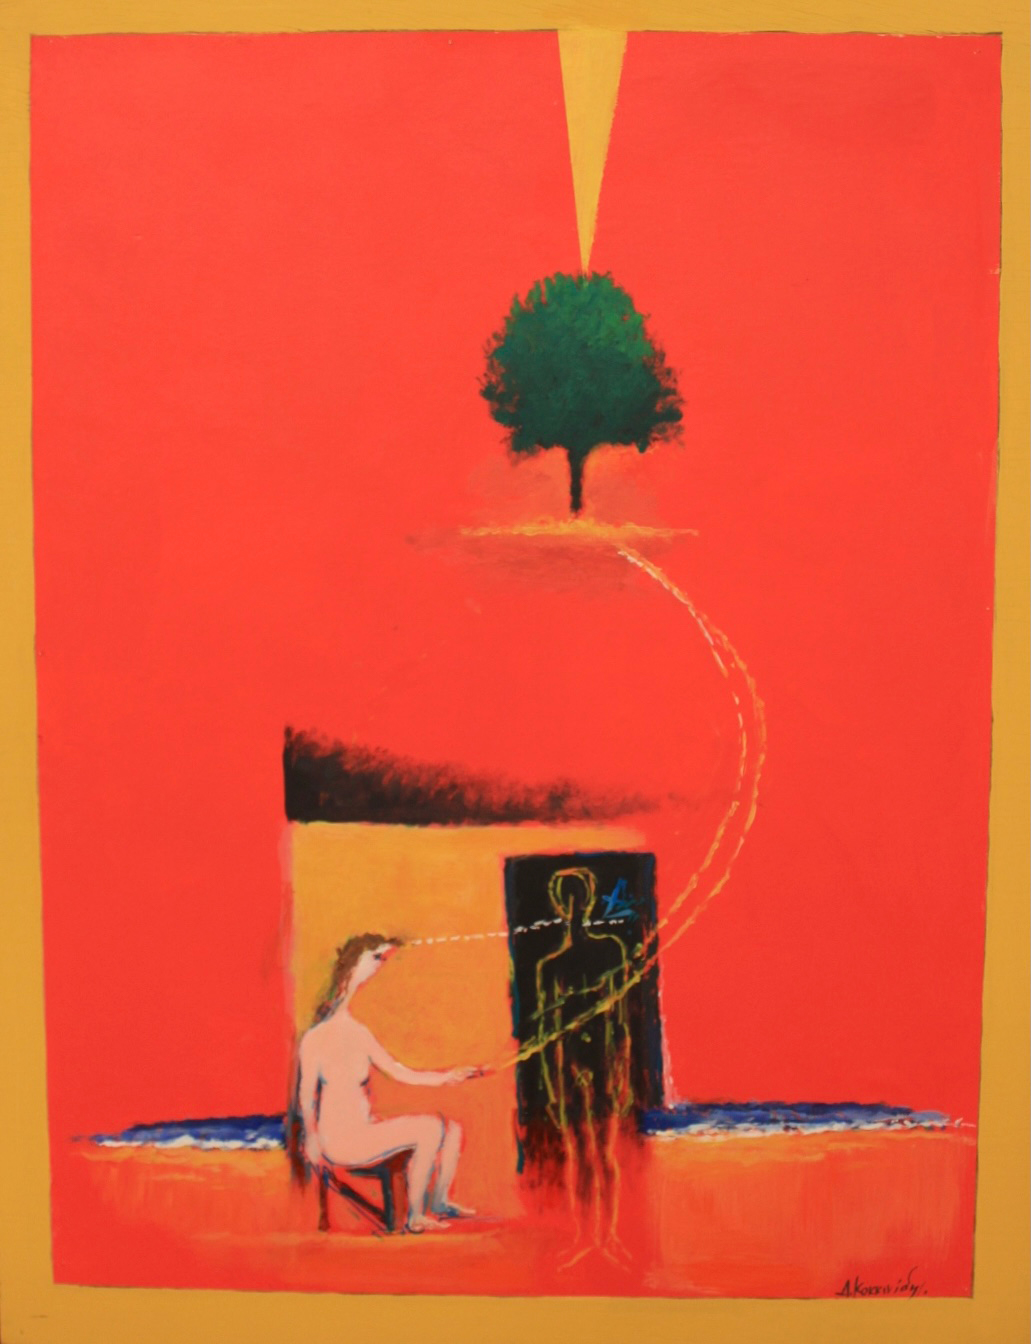 Dimosthenis Kokkinidis, Untitled, acrylics on canvas, 109 x 85 cm